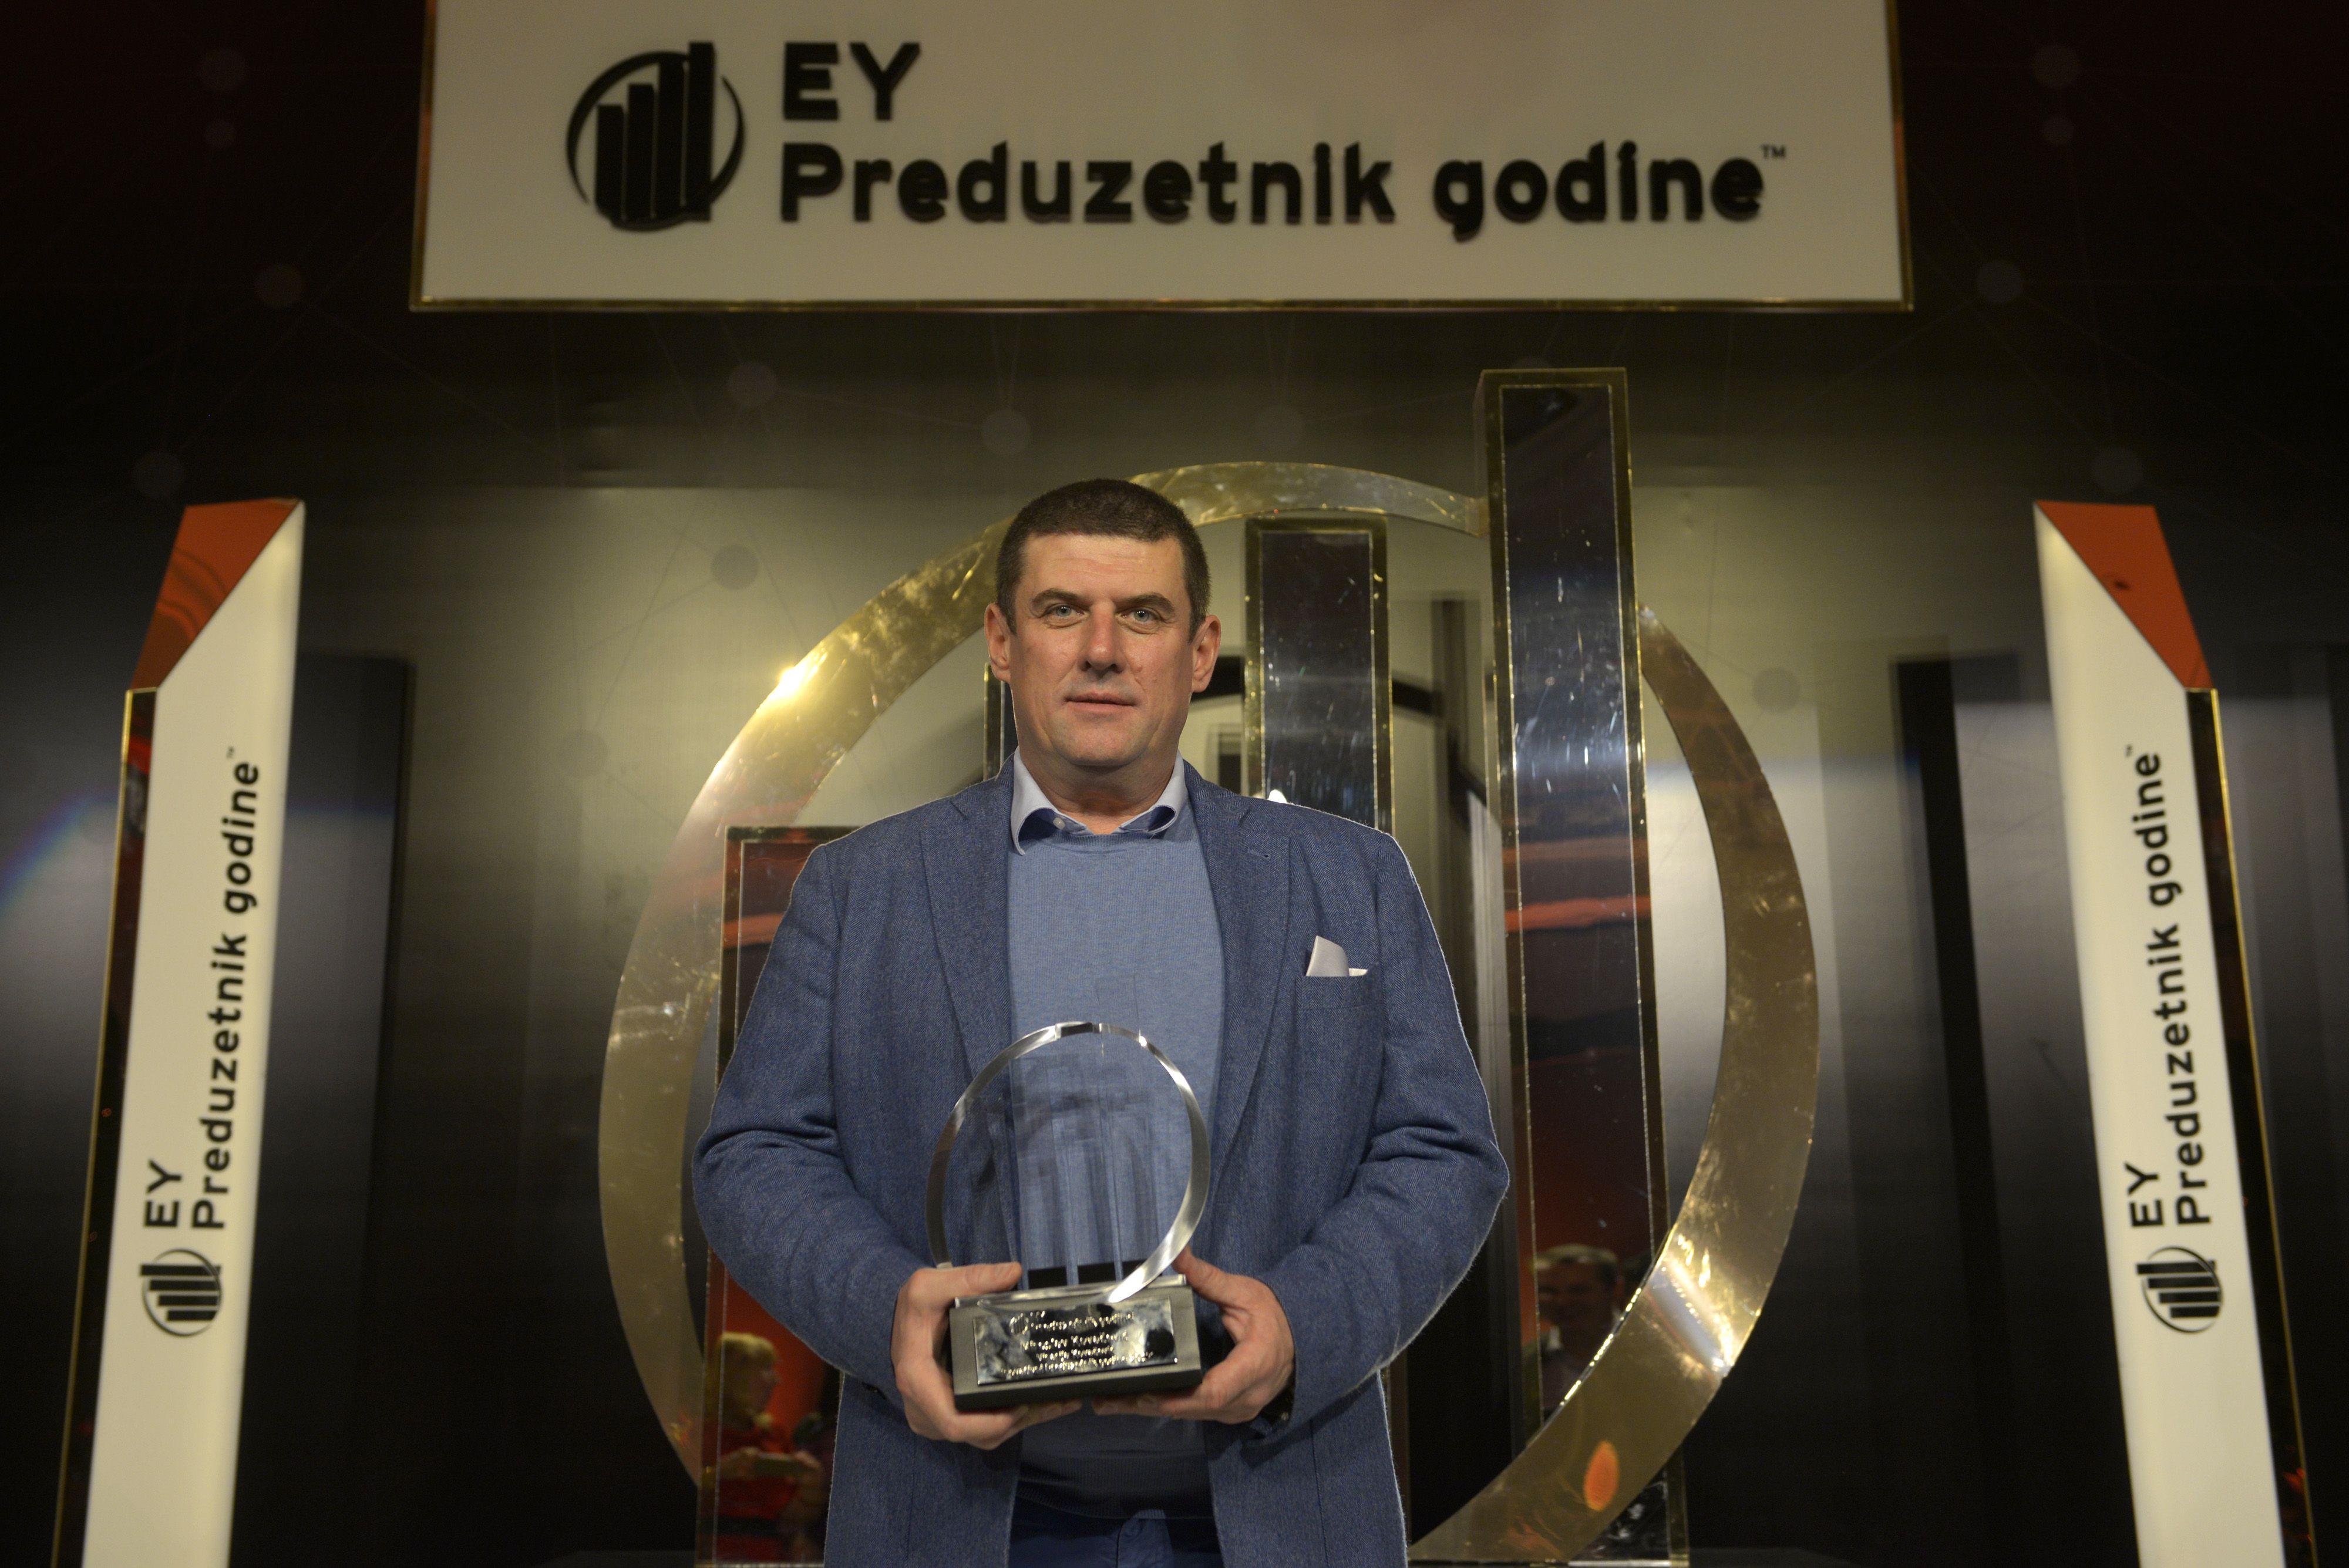 Ey Inovativni Preduzetnik Godine Miroslav Kovacevic Vinarija Kovacevic Denim Jacket Jackets Fashion